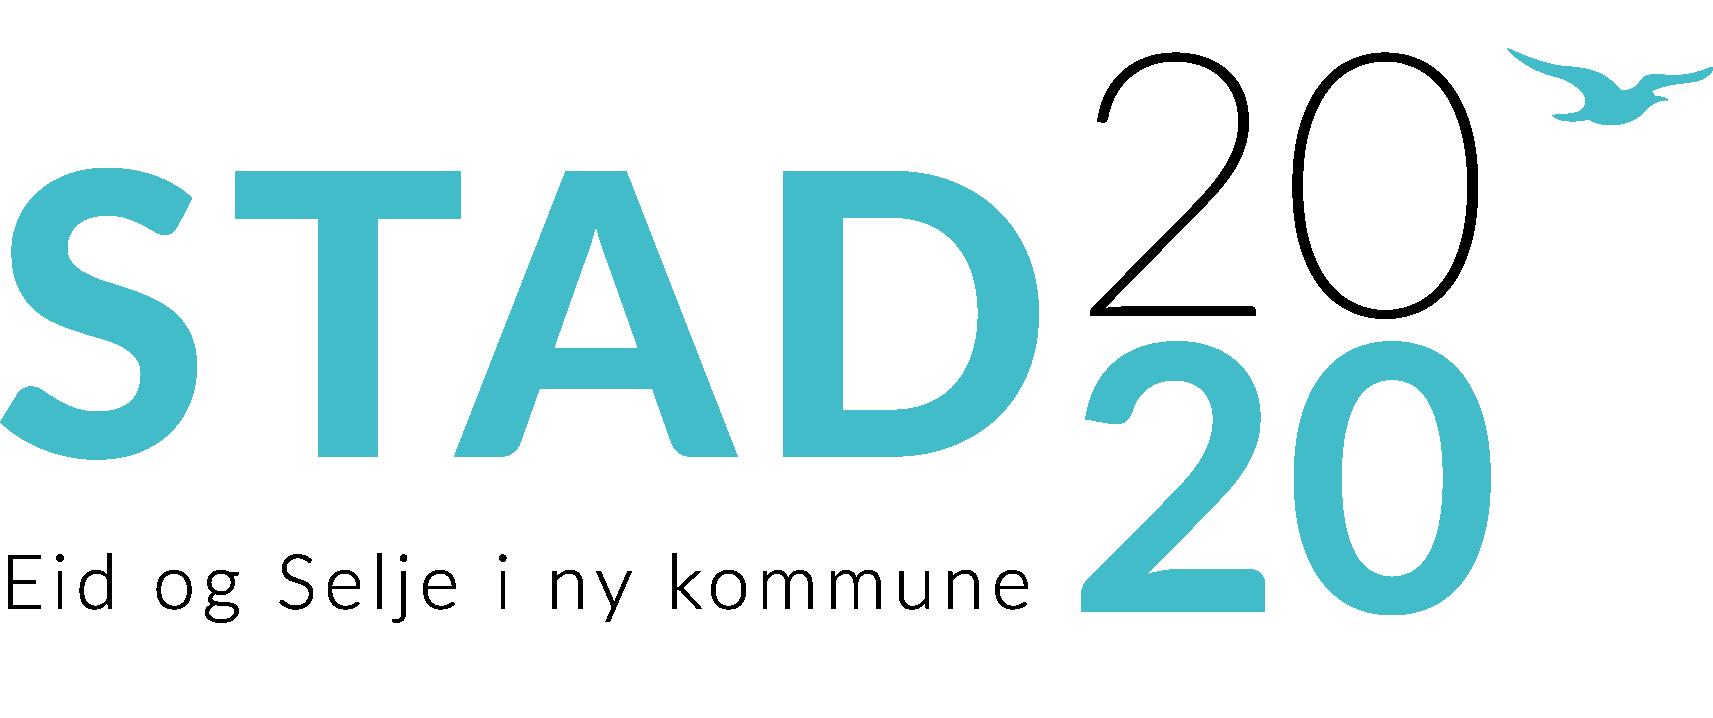 Stad 2020